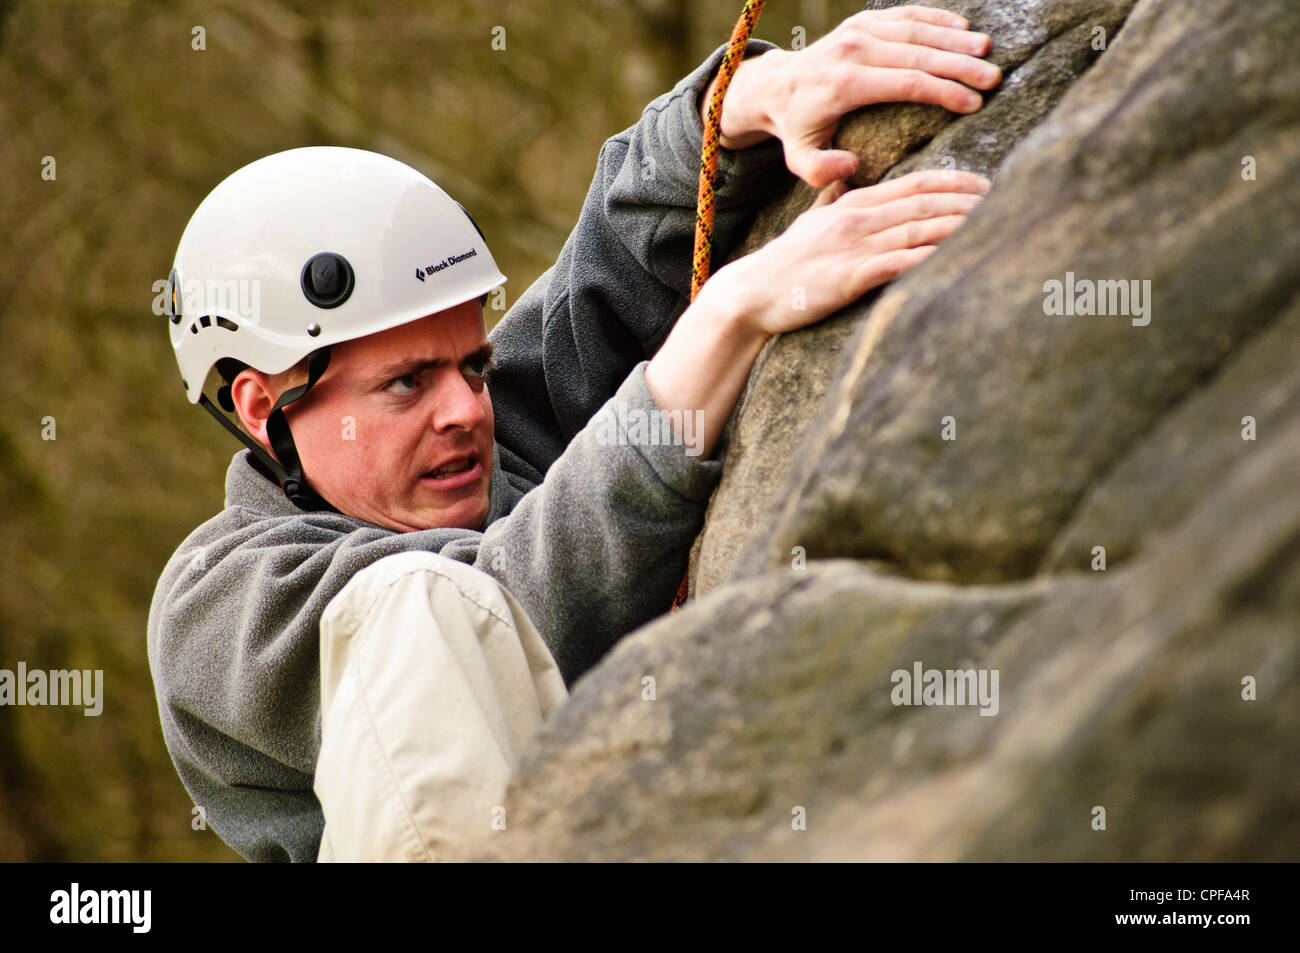 Climber on Tody's Wall, Froggatt Edge, Peak District graded HVS 5a - Stock Image